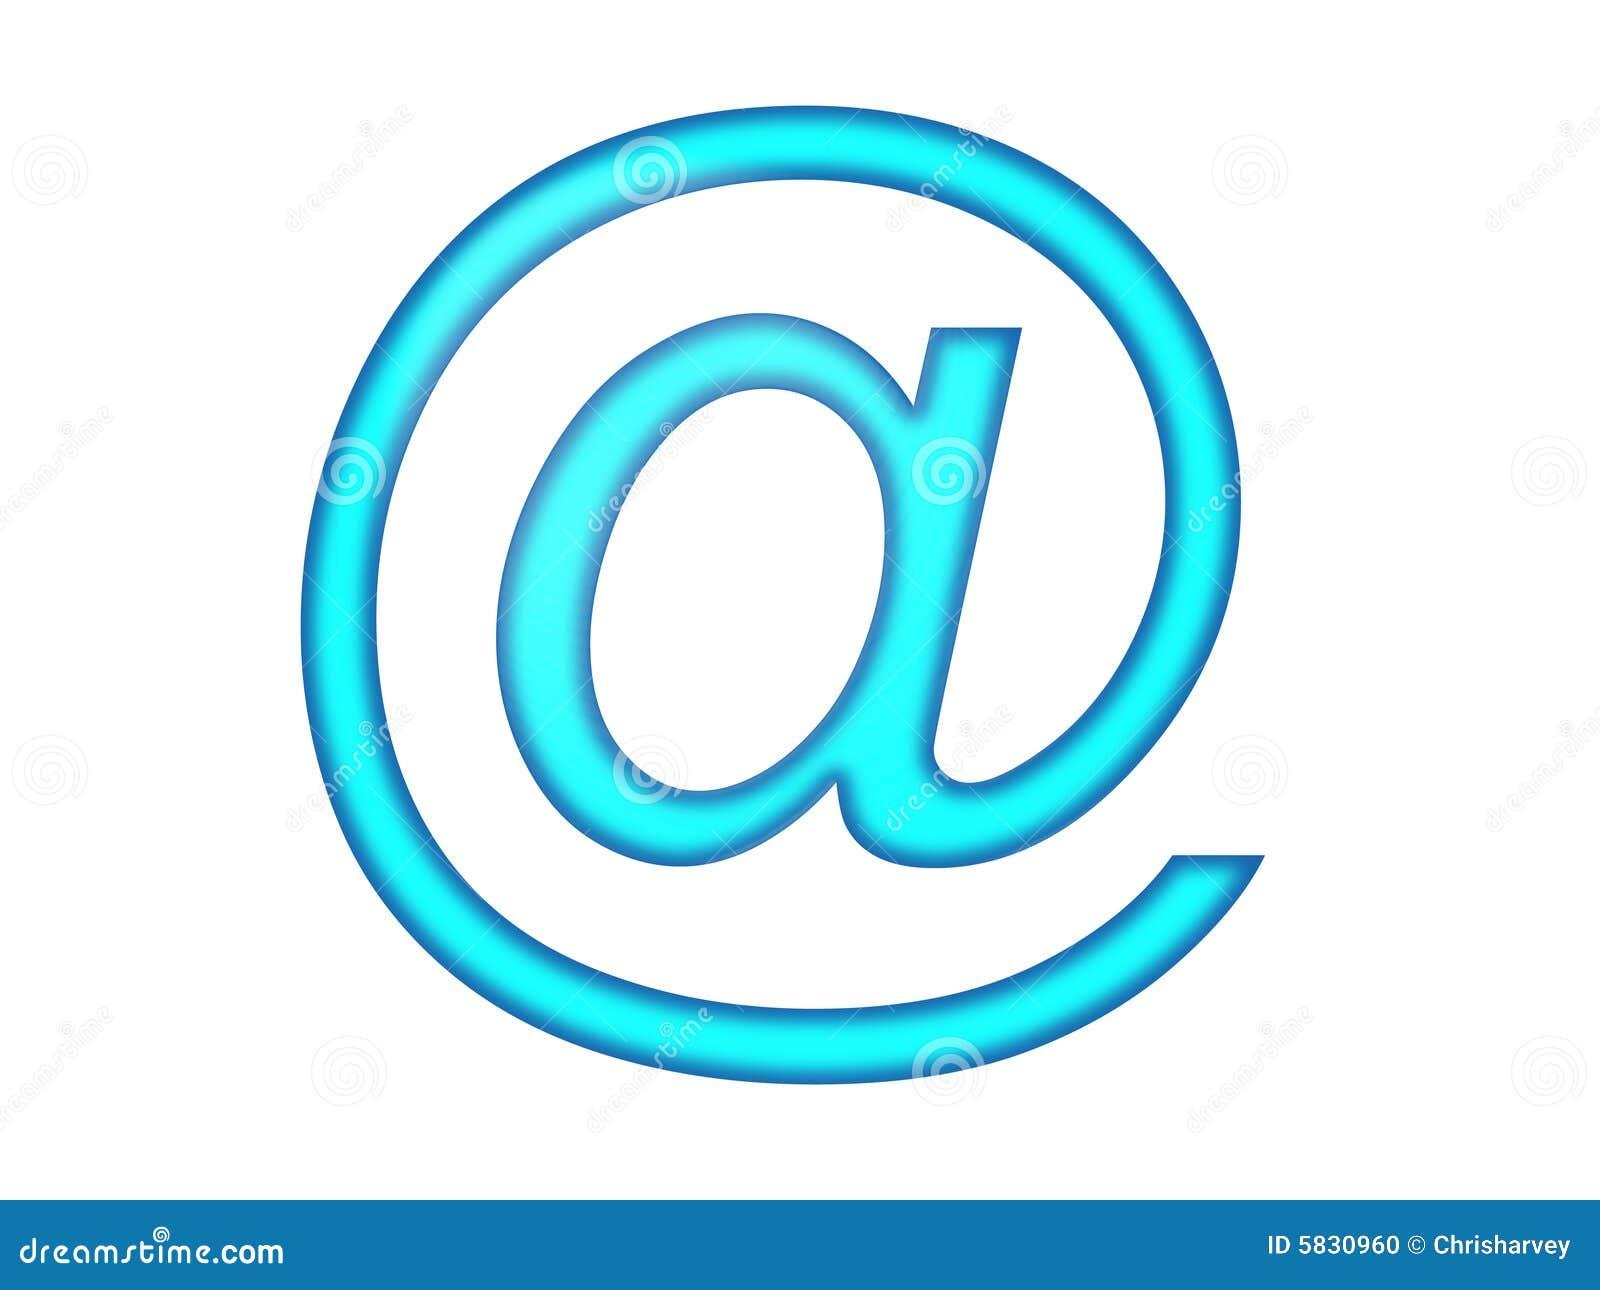 internet-symbol-5830960.jpg